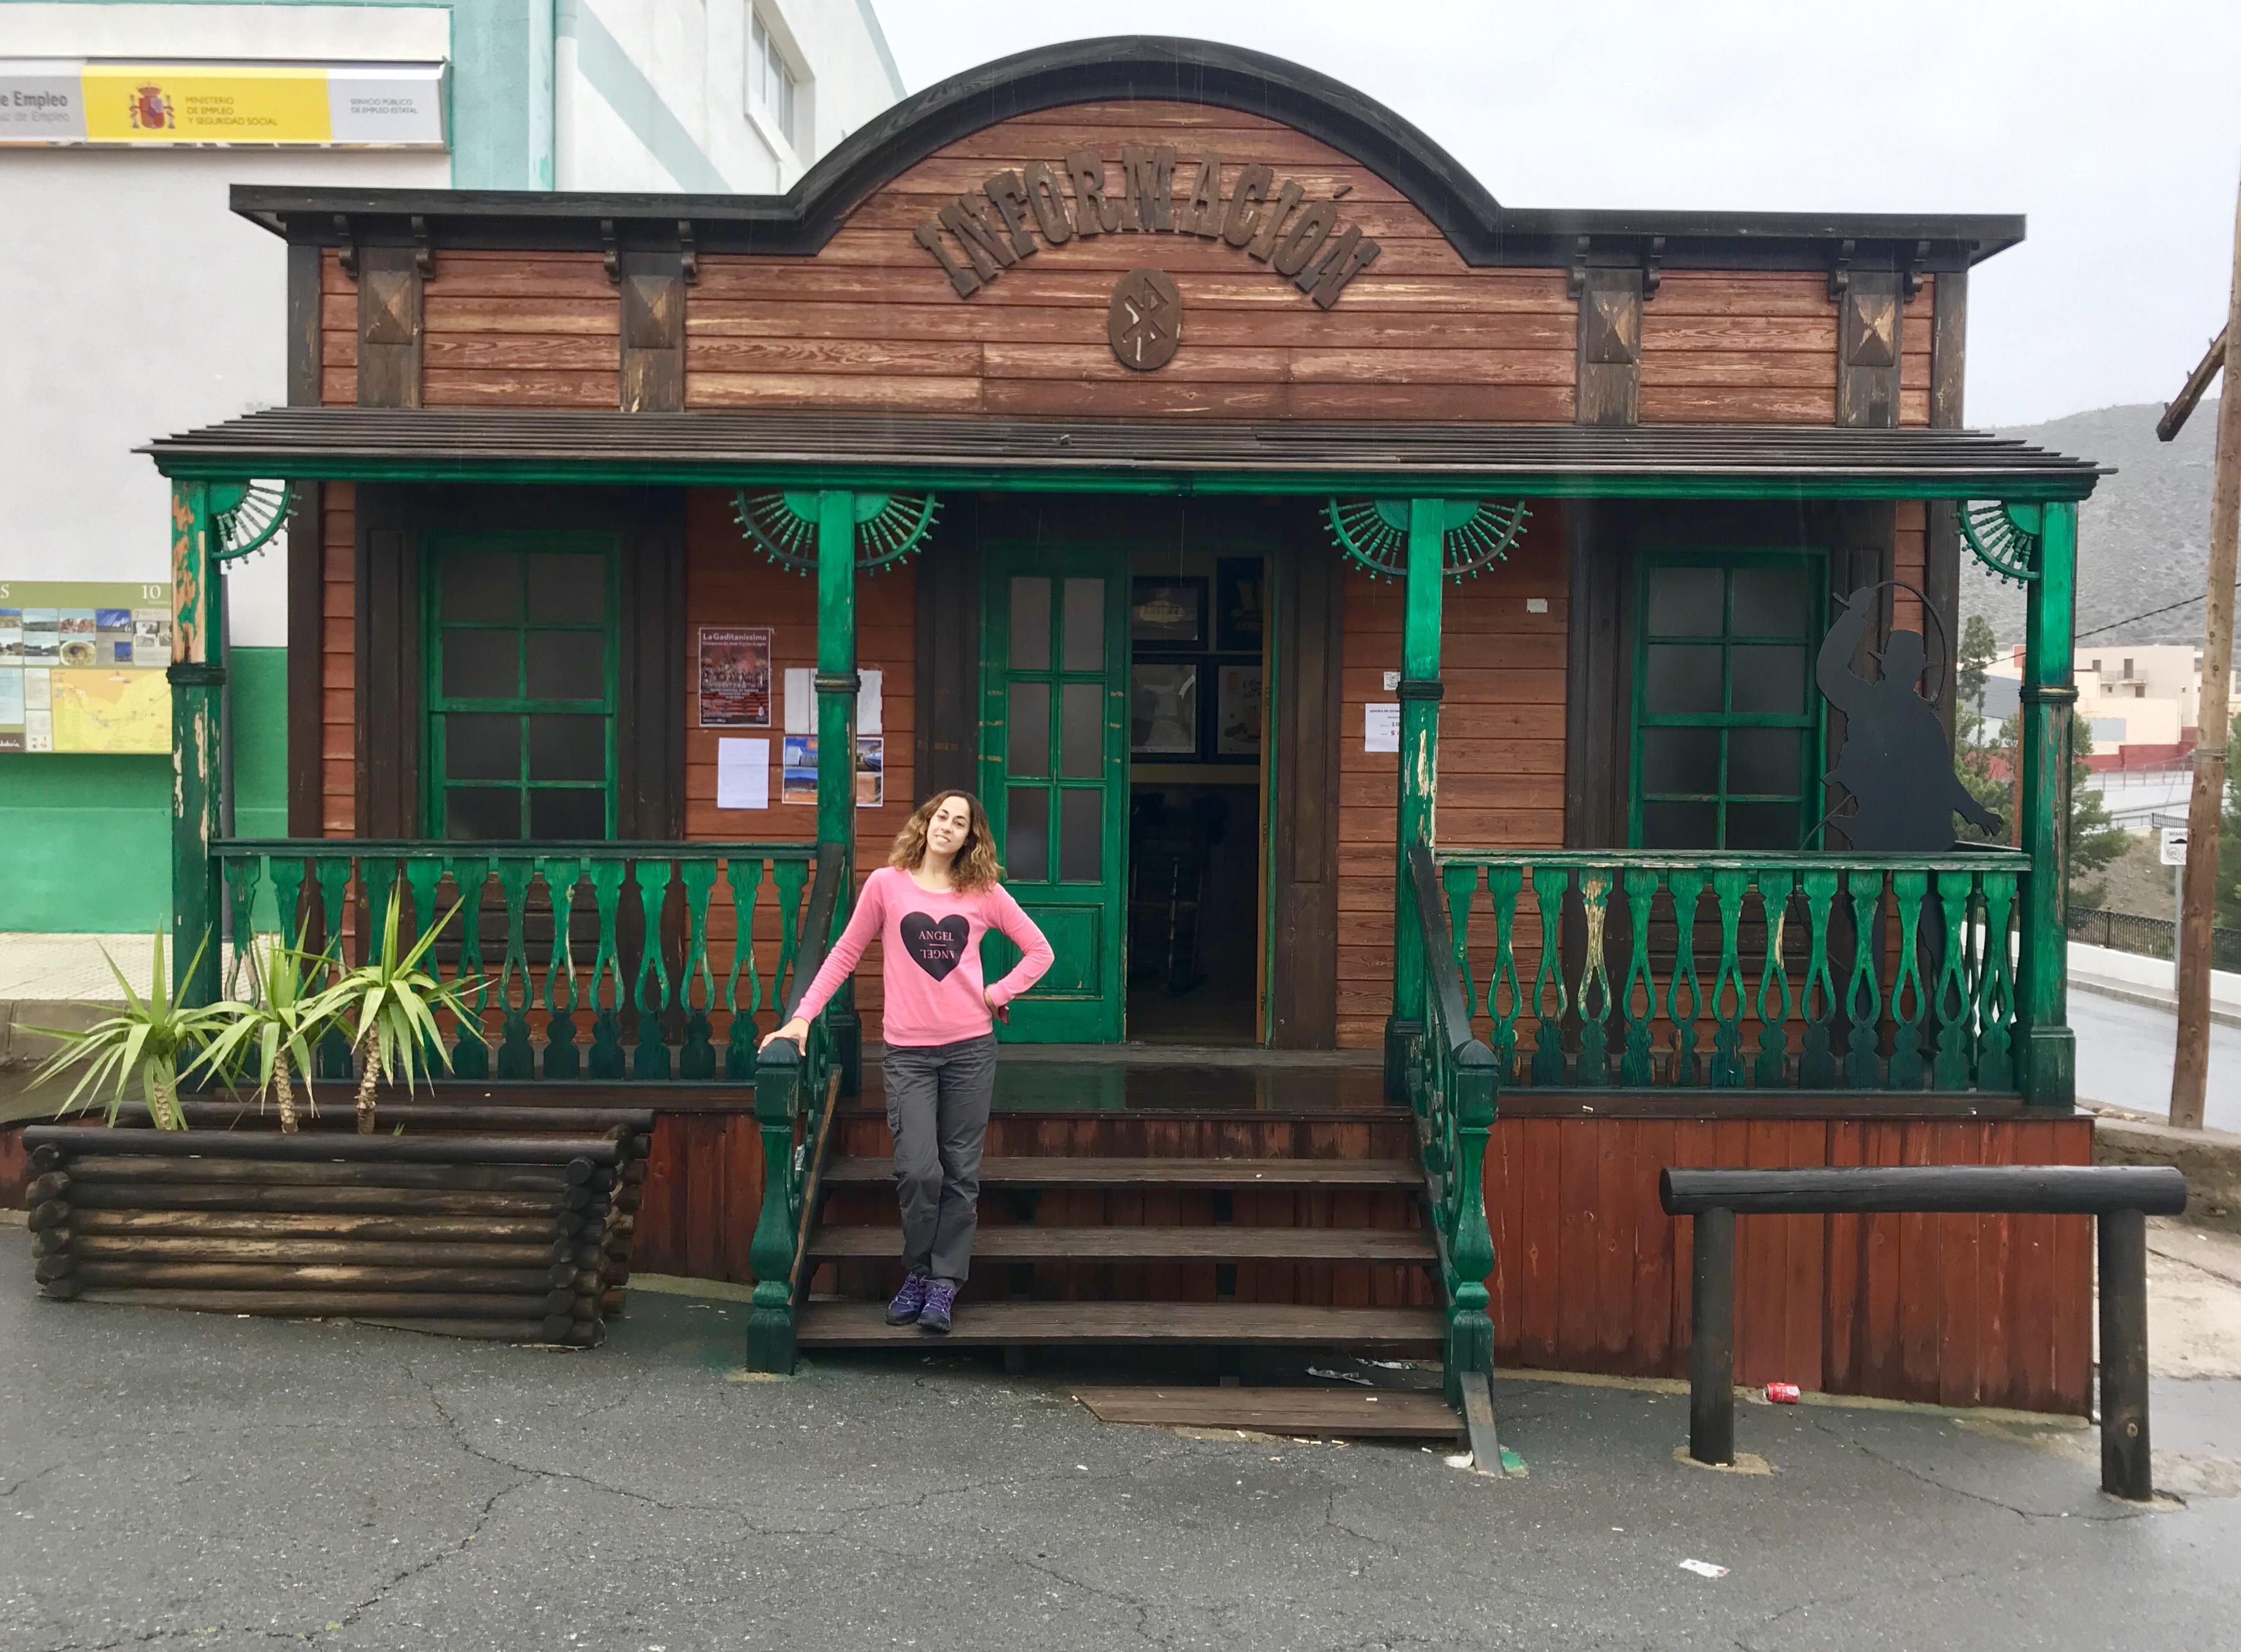 Oficina de Turismo de tabernas